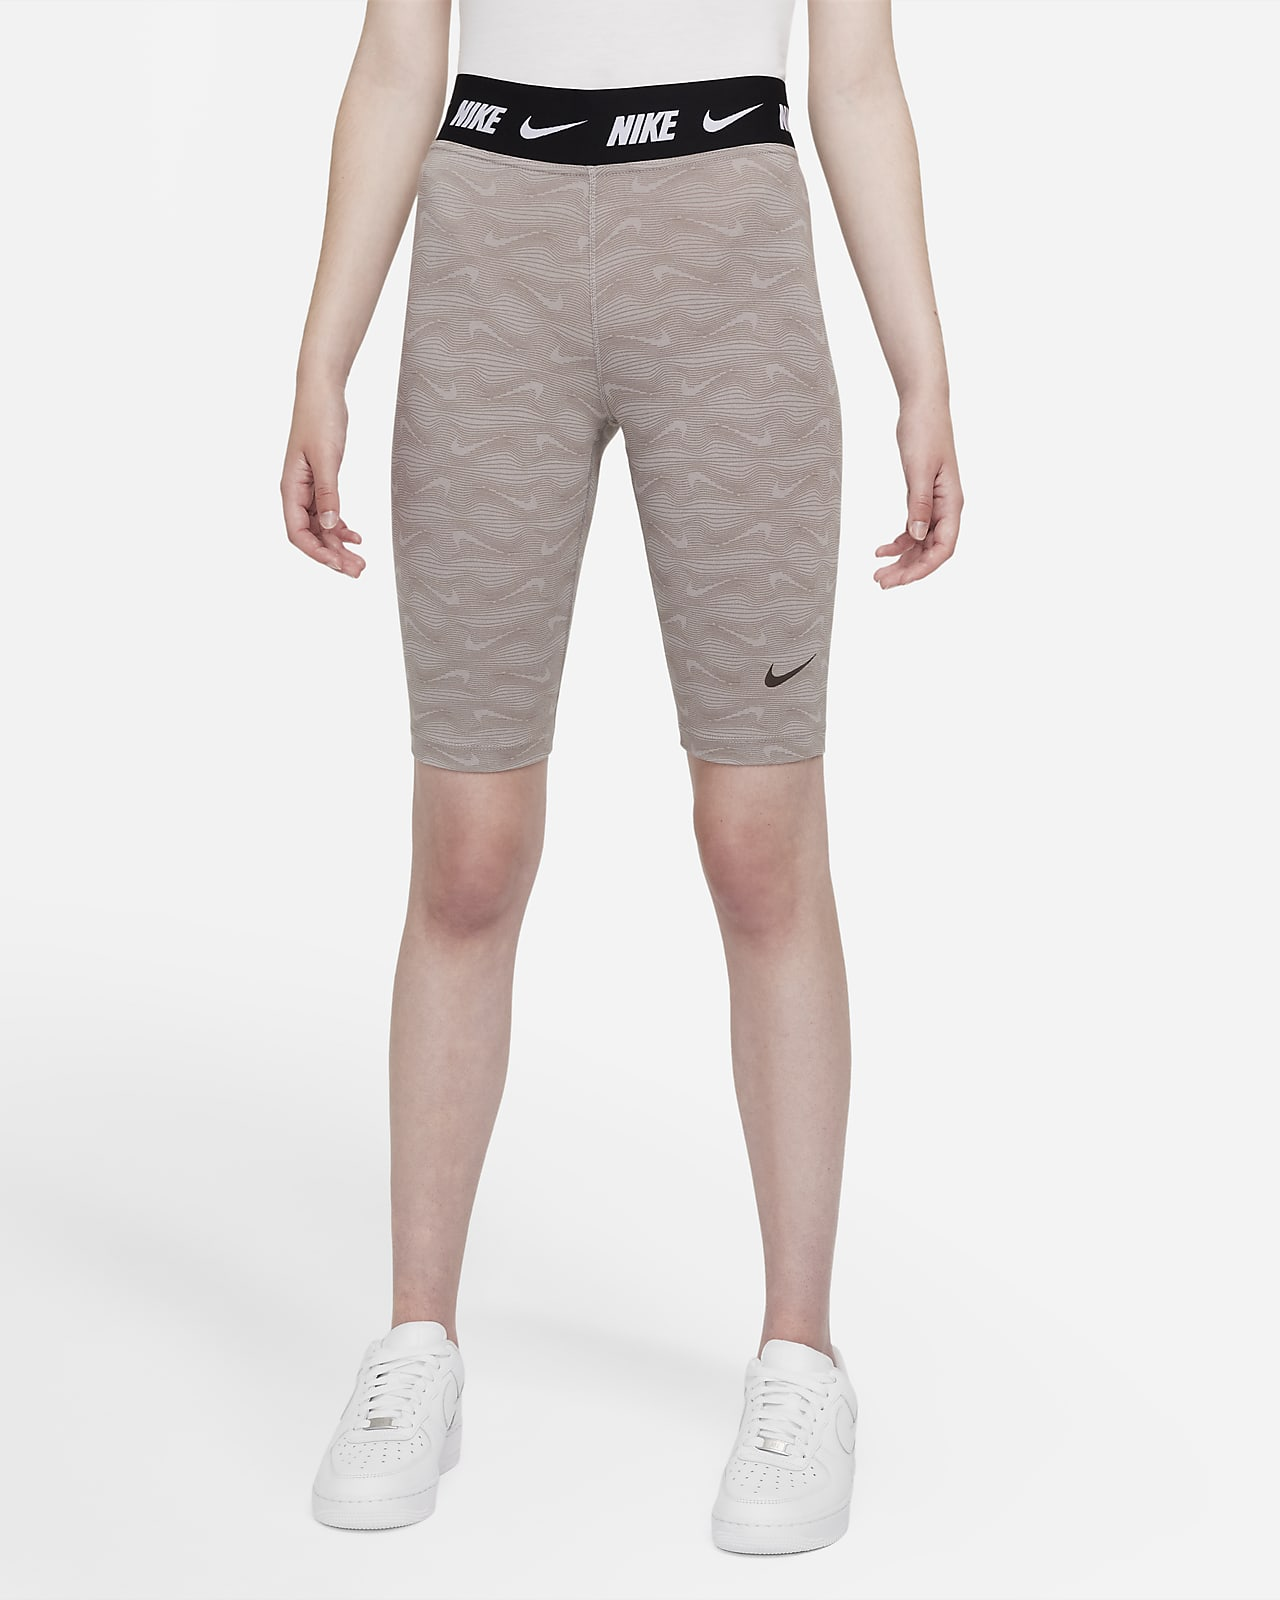 Nike Sportswear Damesshorts met print